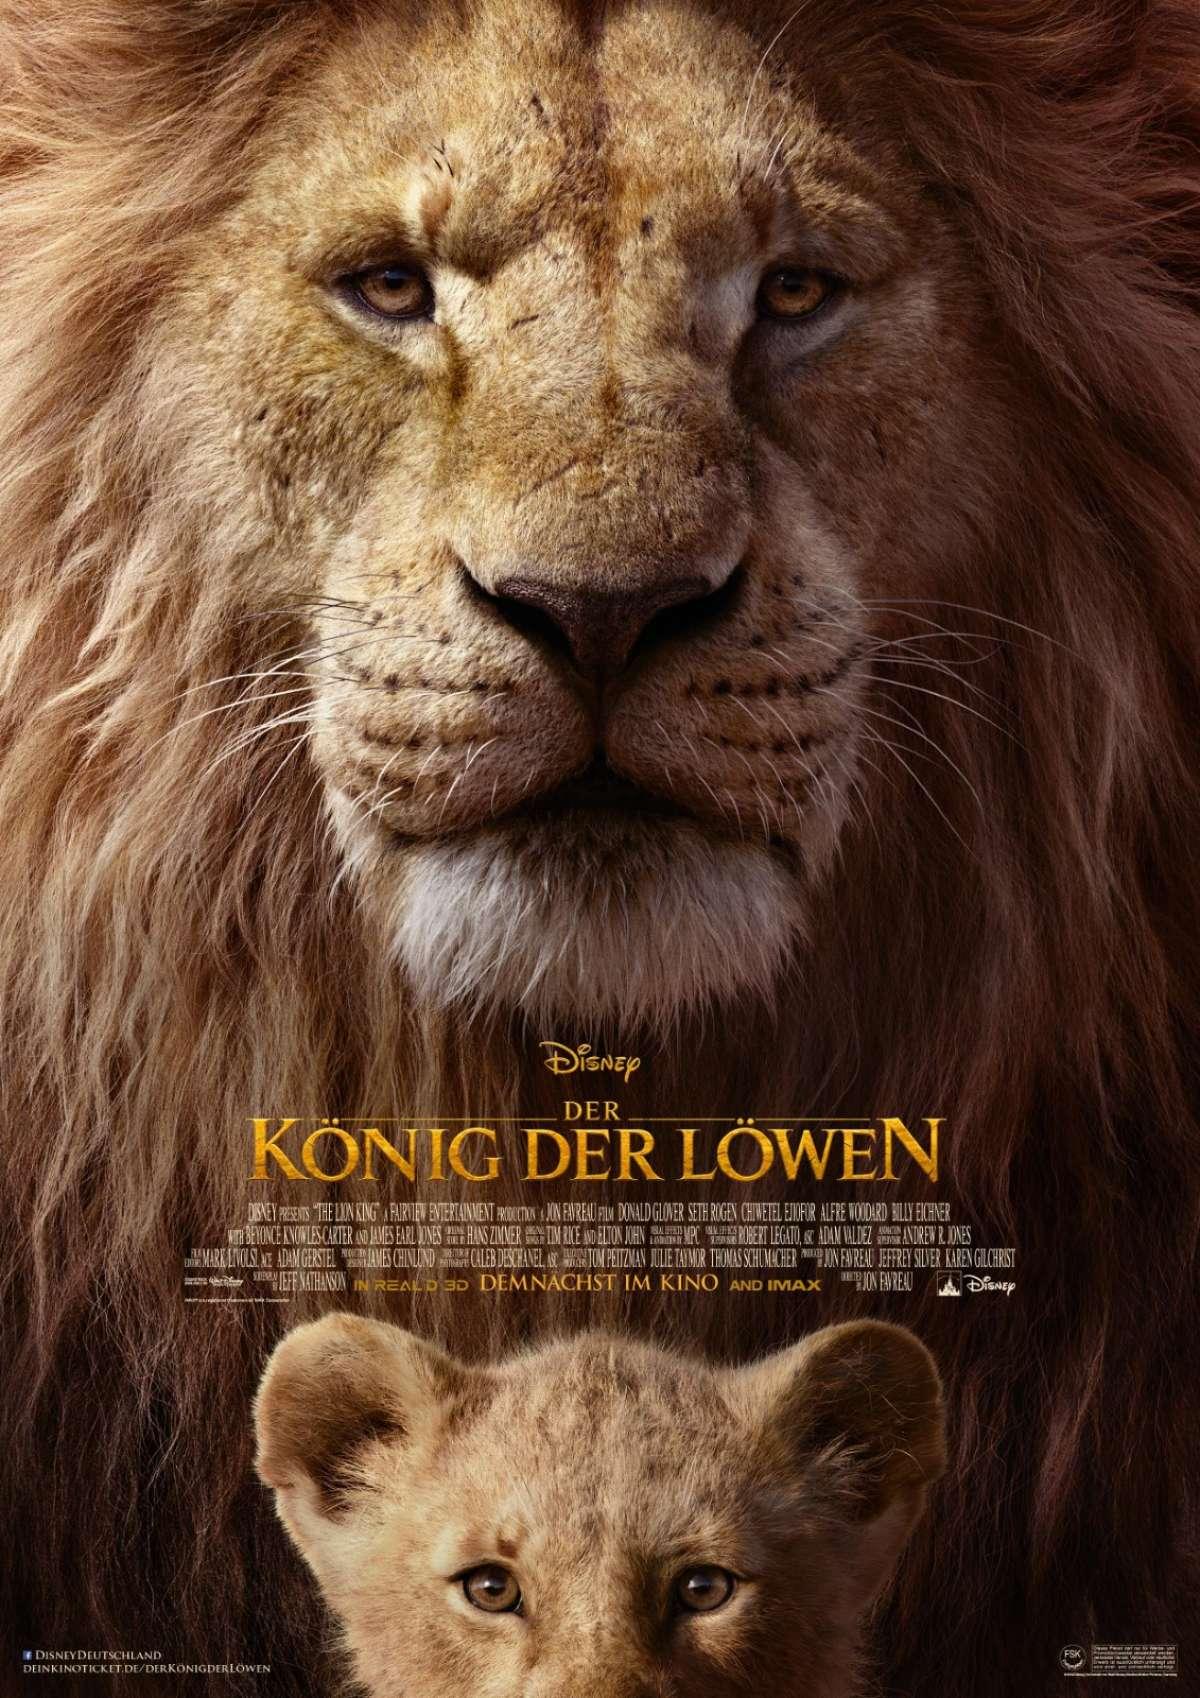 König der Löwen - Autokino Treysa - Schwalmstadt-Treysa